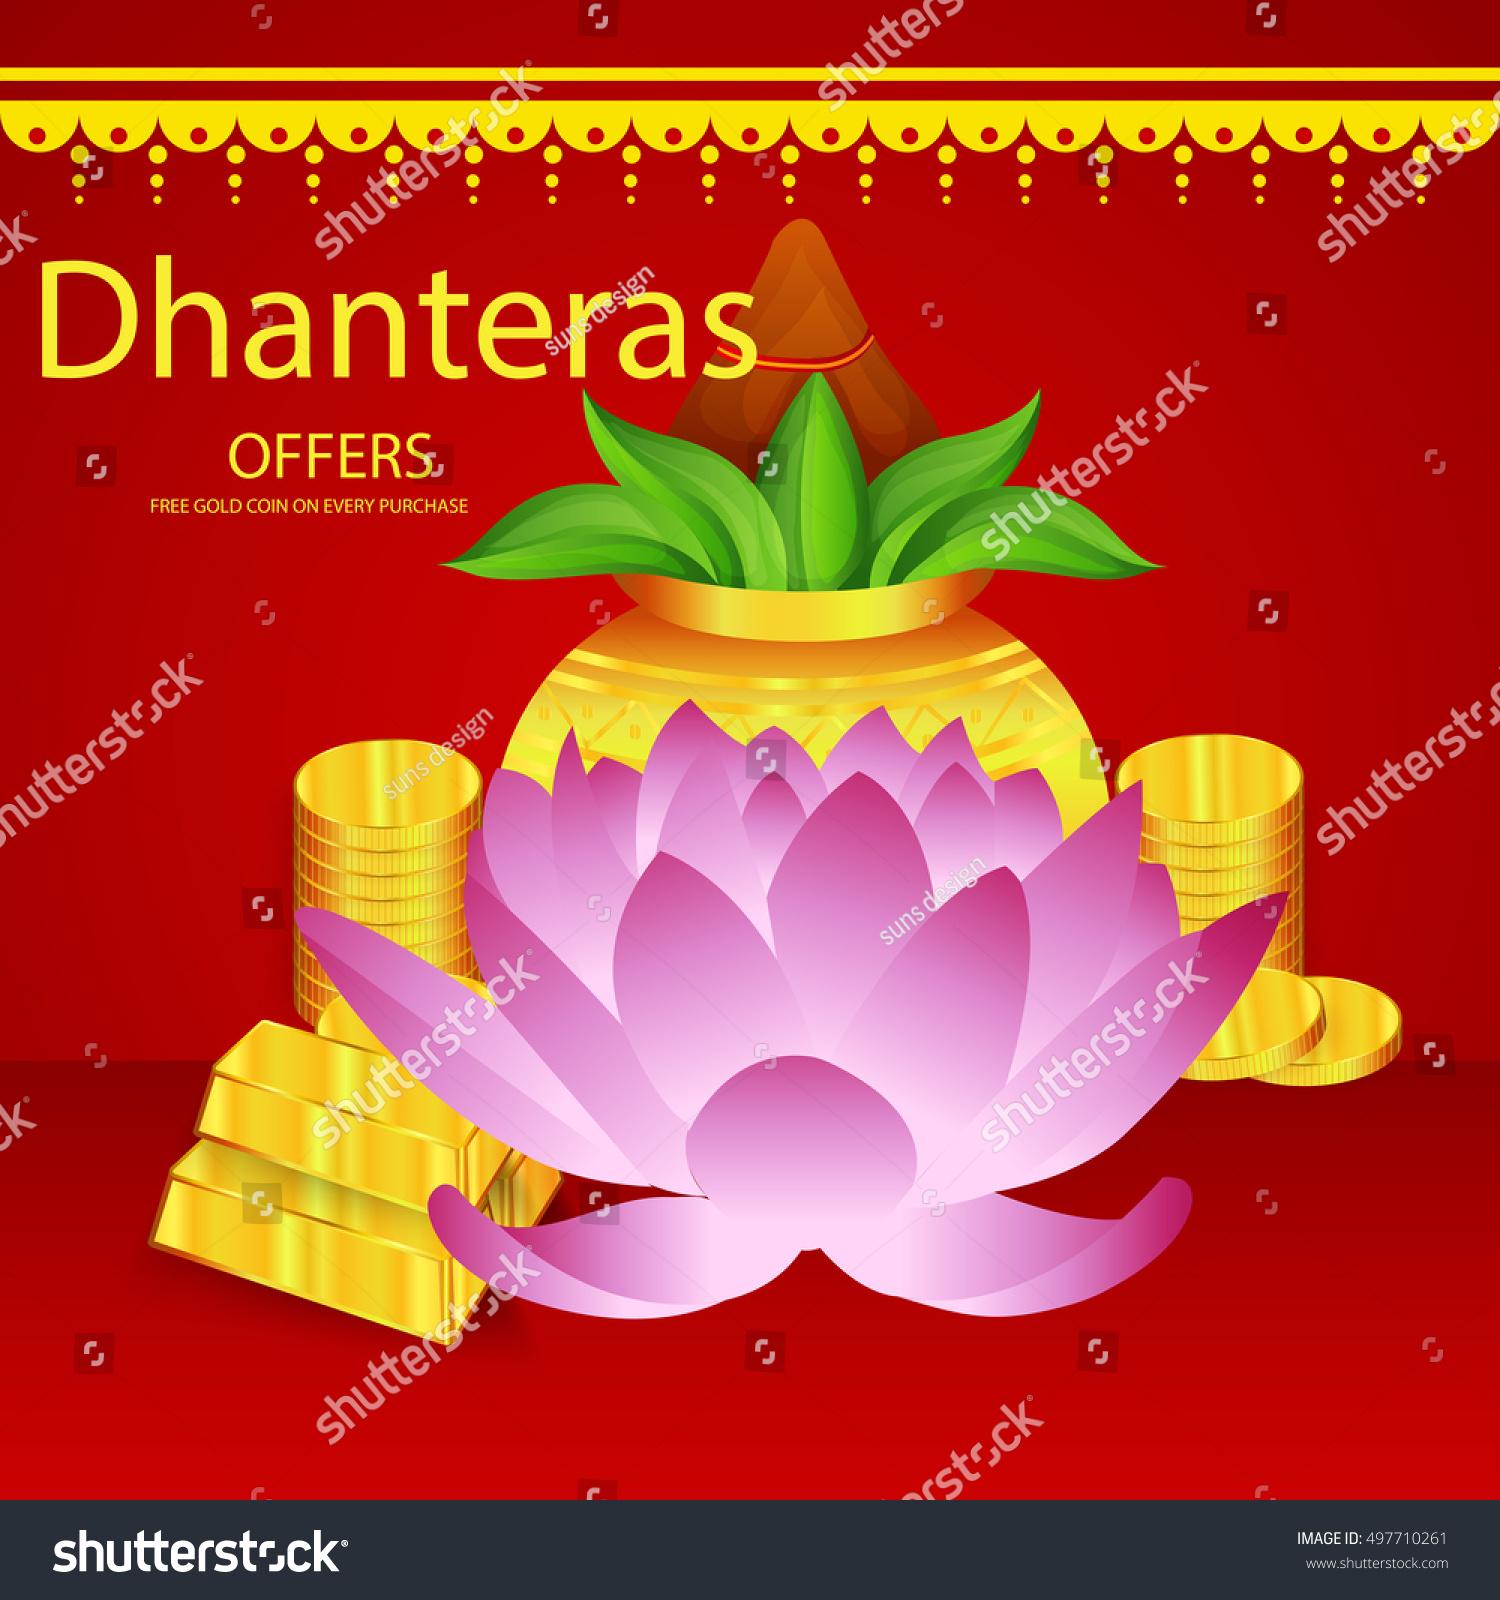 Vector illustration of a Sale banner or sale poster for festival of dhanteras diwali festival celebration